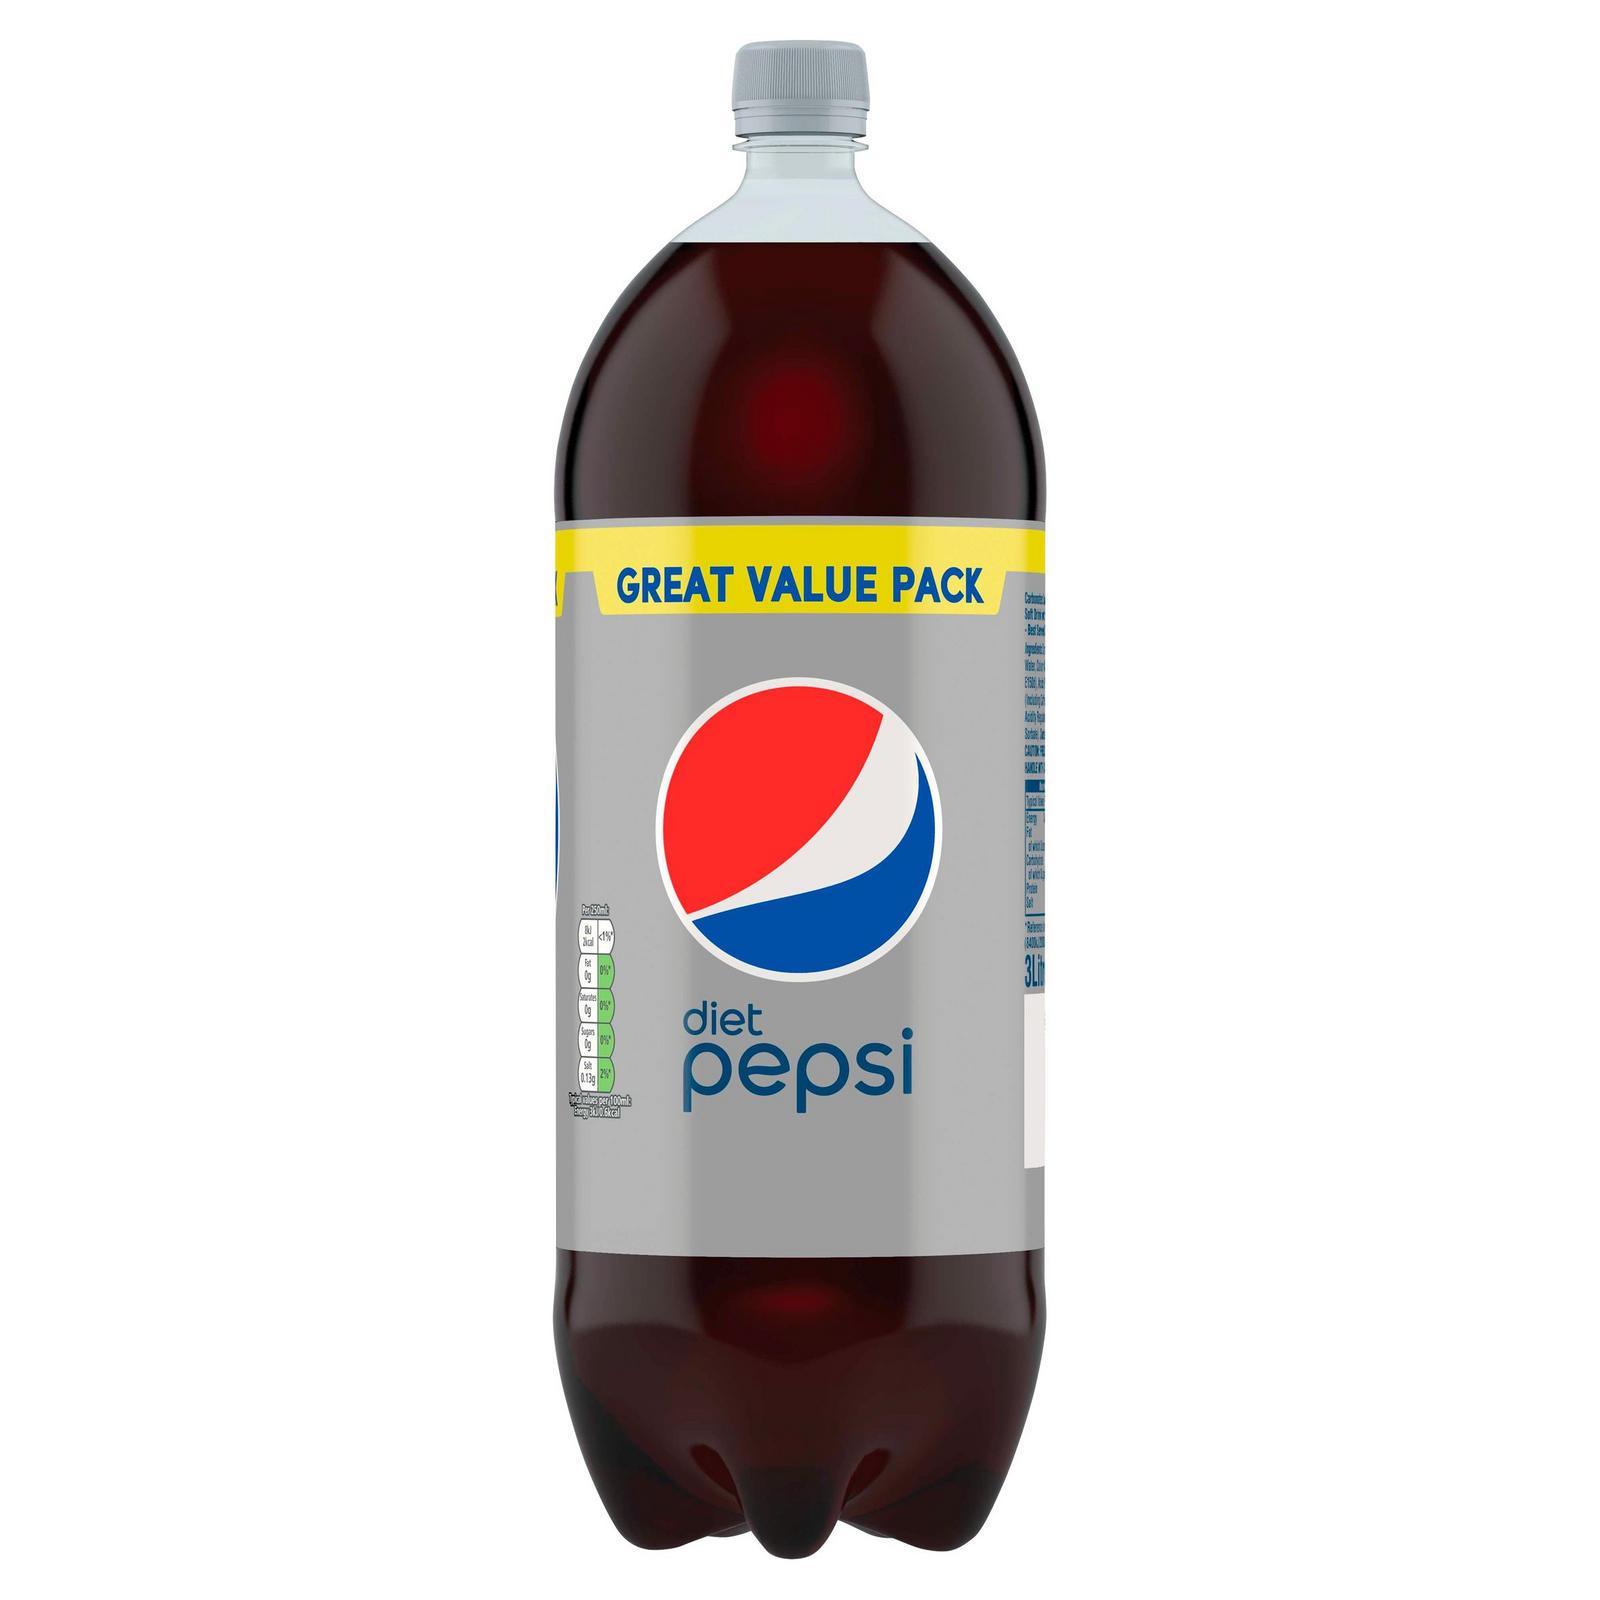 Diet Pepsi 3L for £1.50 @ Iceland (online)